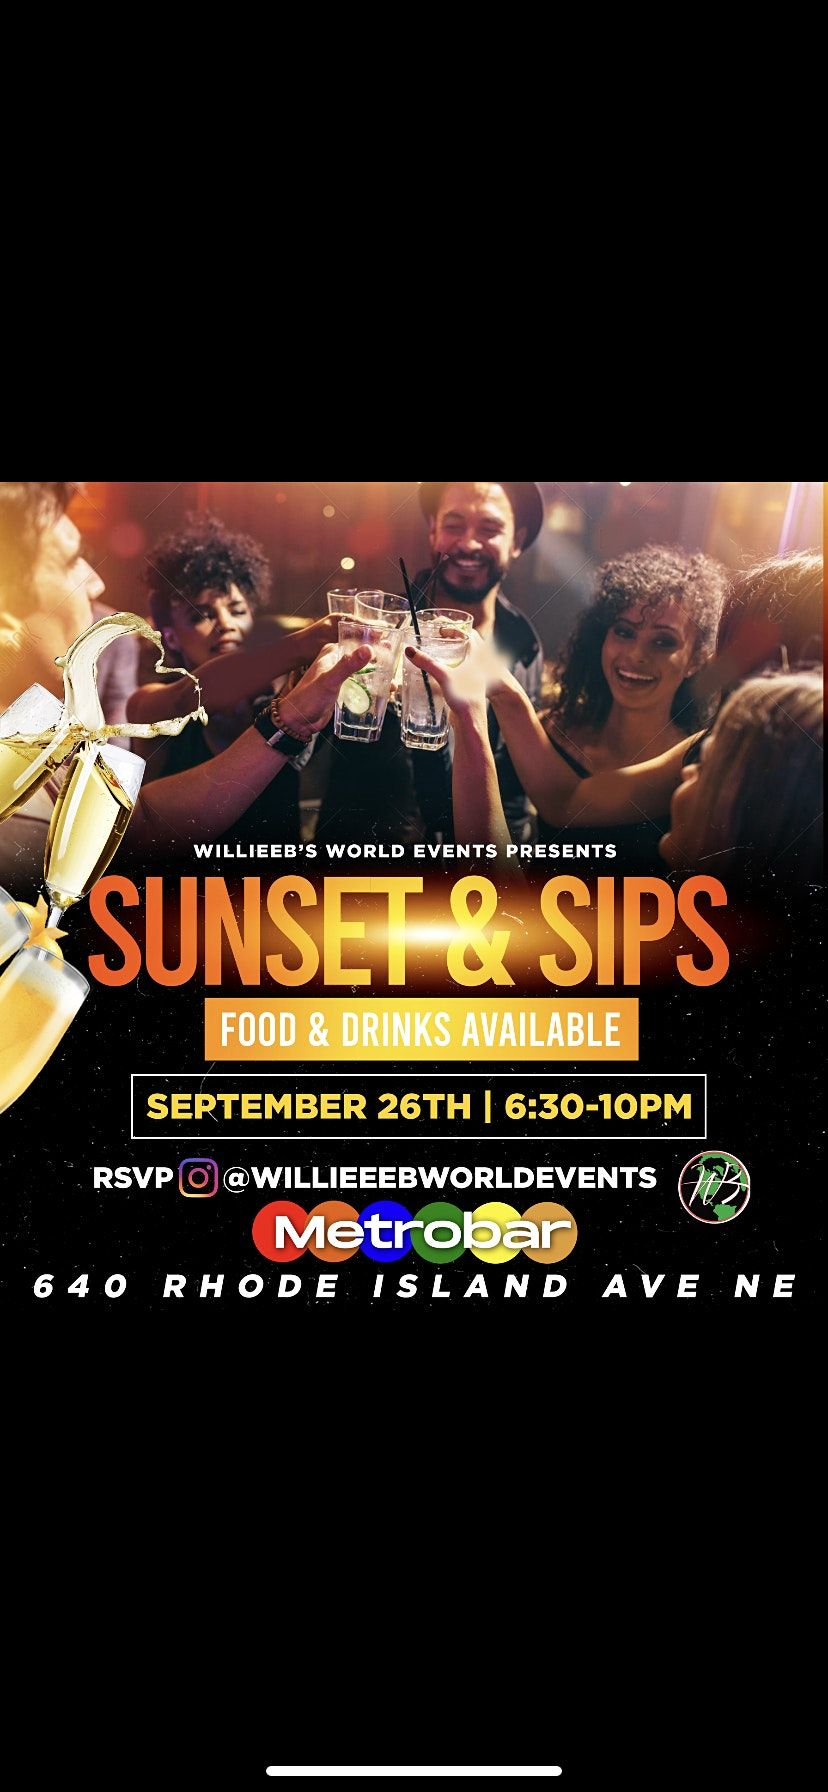 WillieeB\u2019s World Events Presents Sunset & Sips